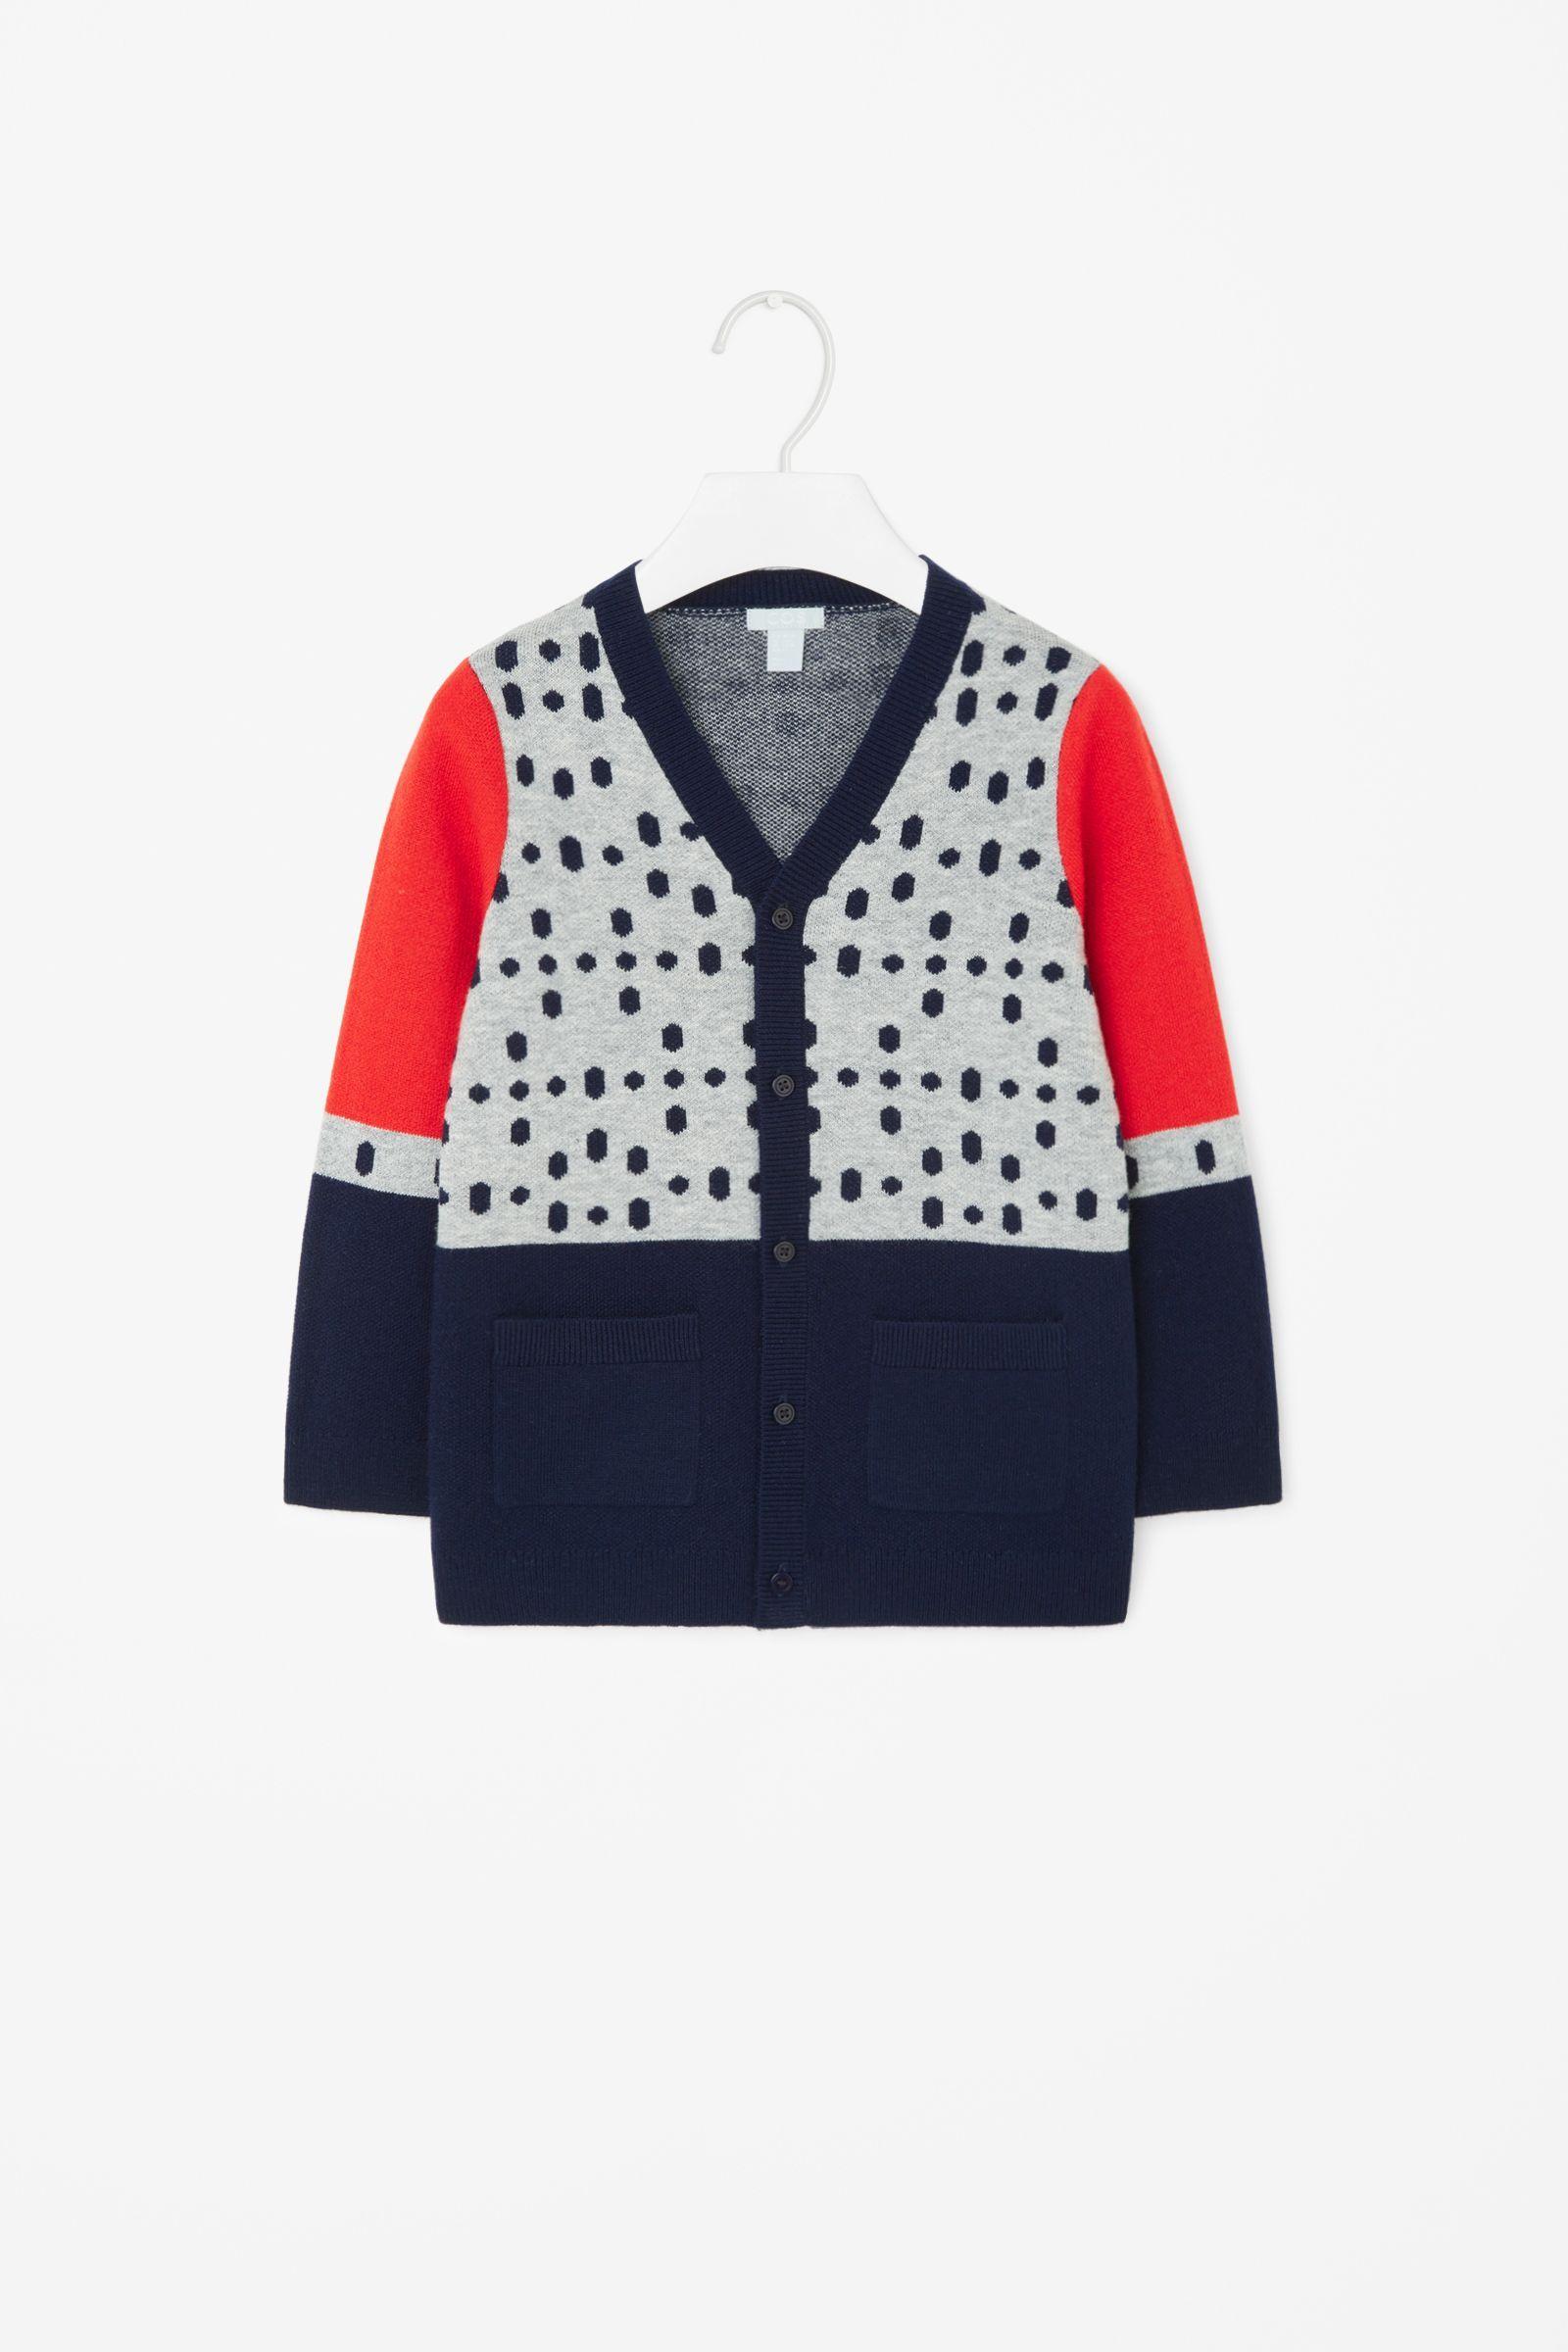 Block colour cardigan | Cardigan, Fashion, Sweaters